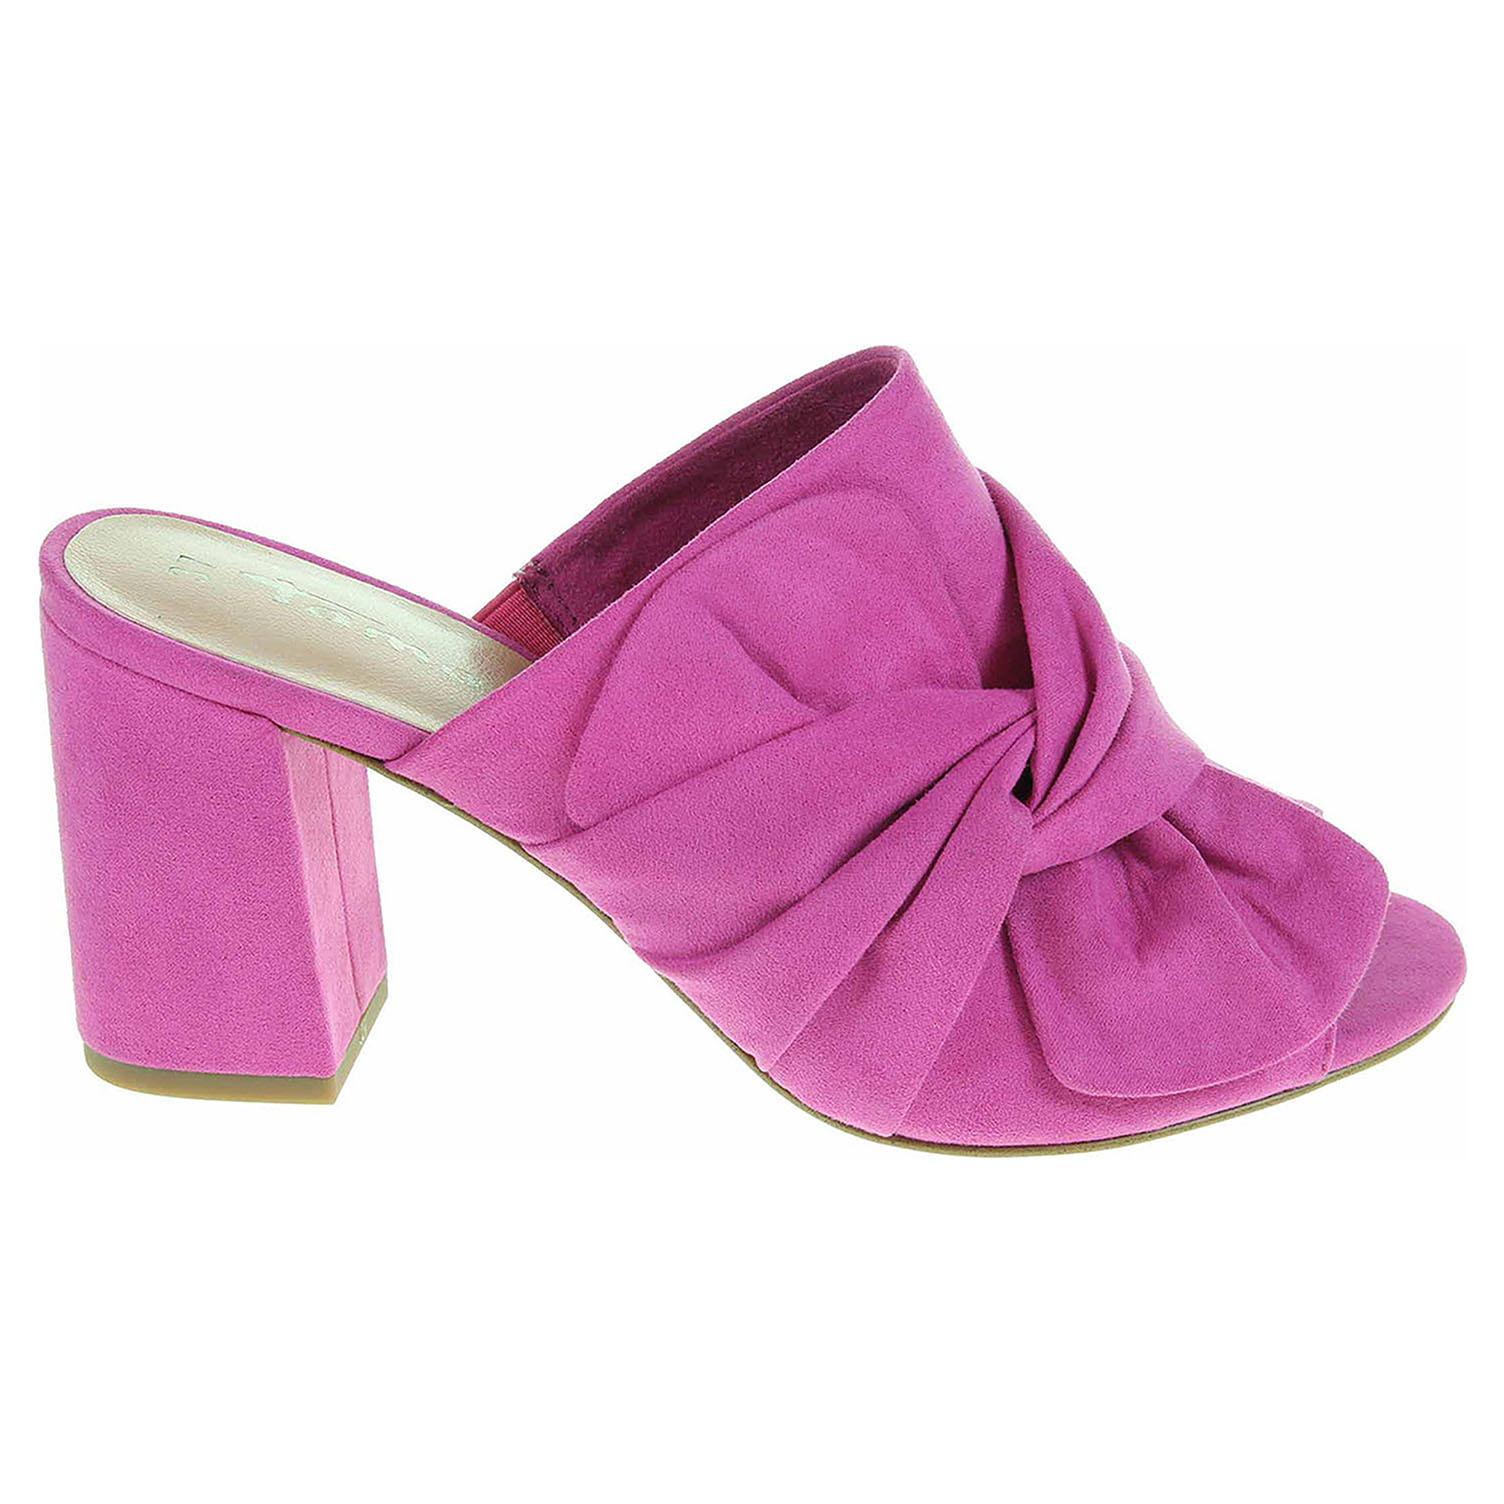 Ecco Tamaris dámské pantofle 1-27234-20 pink suede 23600820 9006bc279c